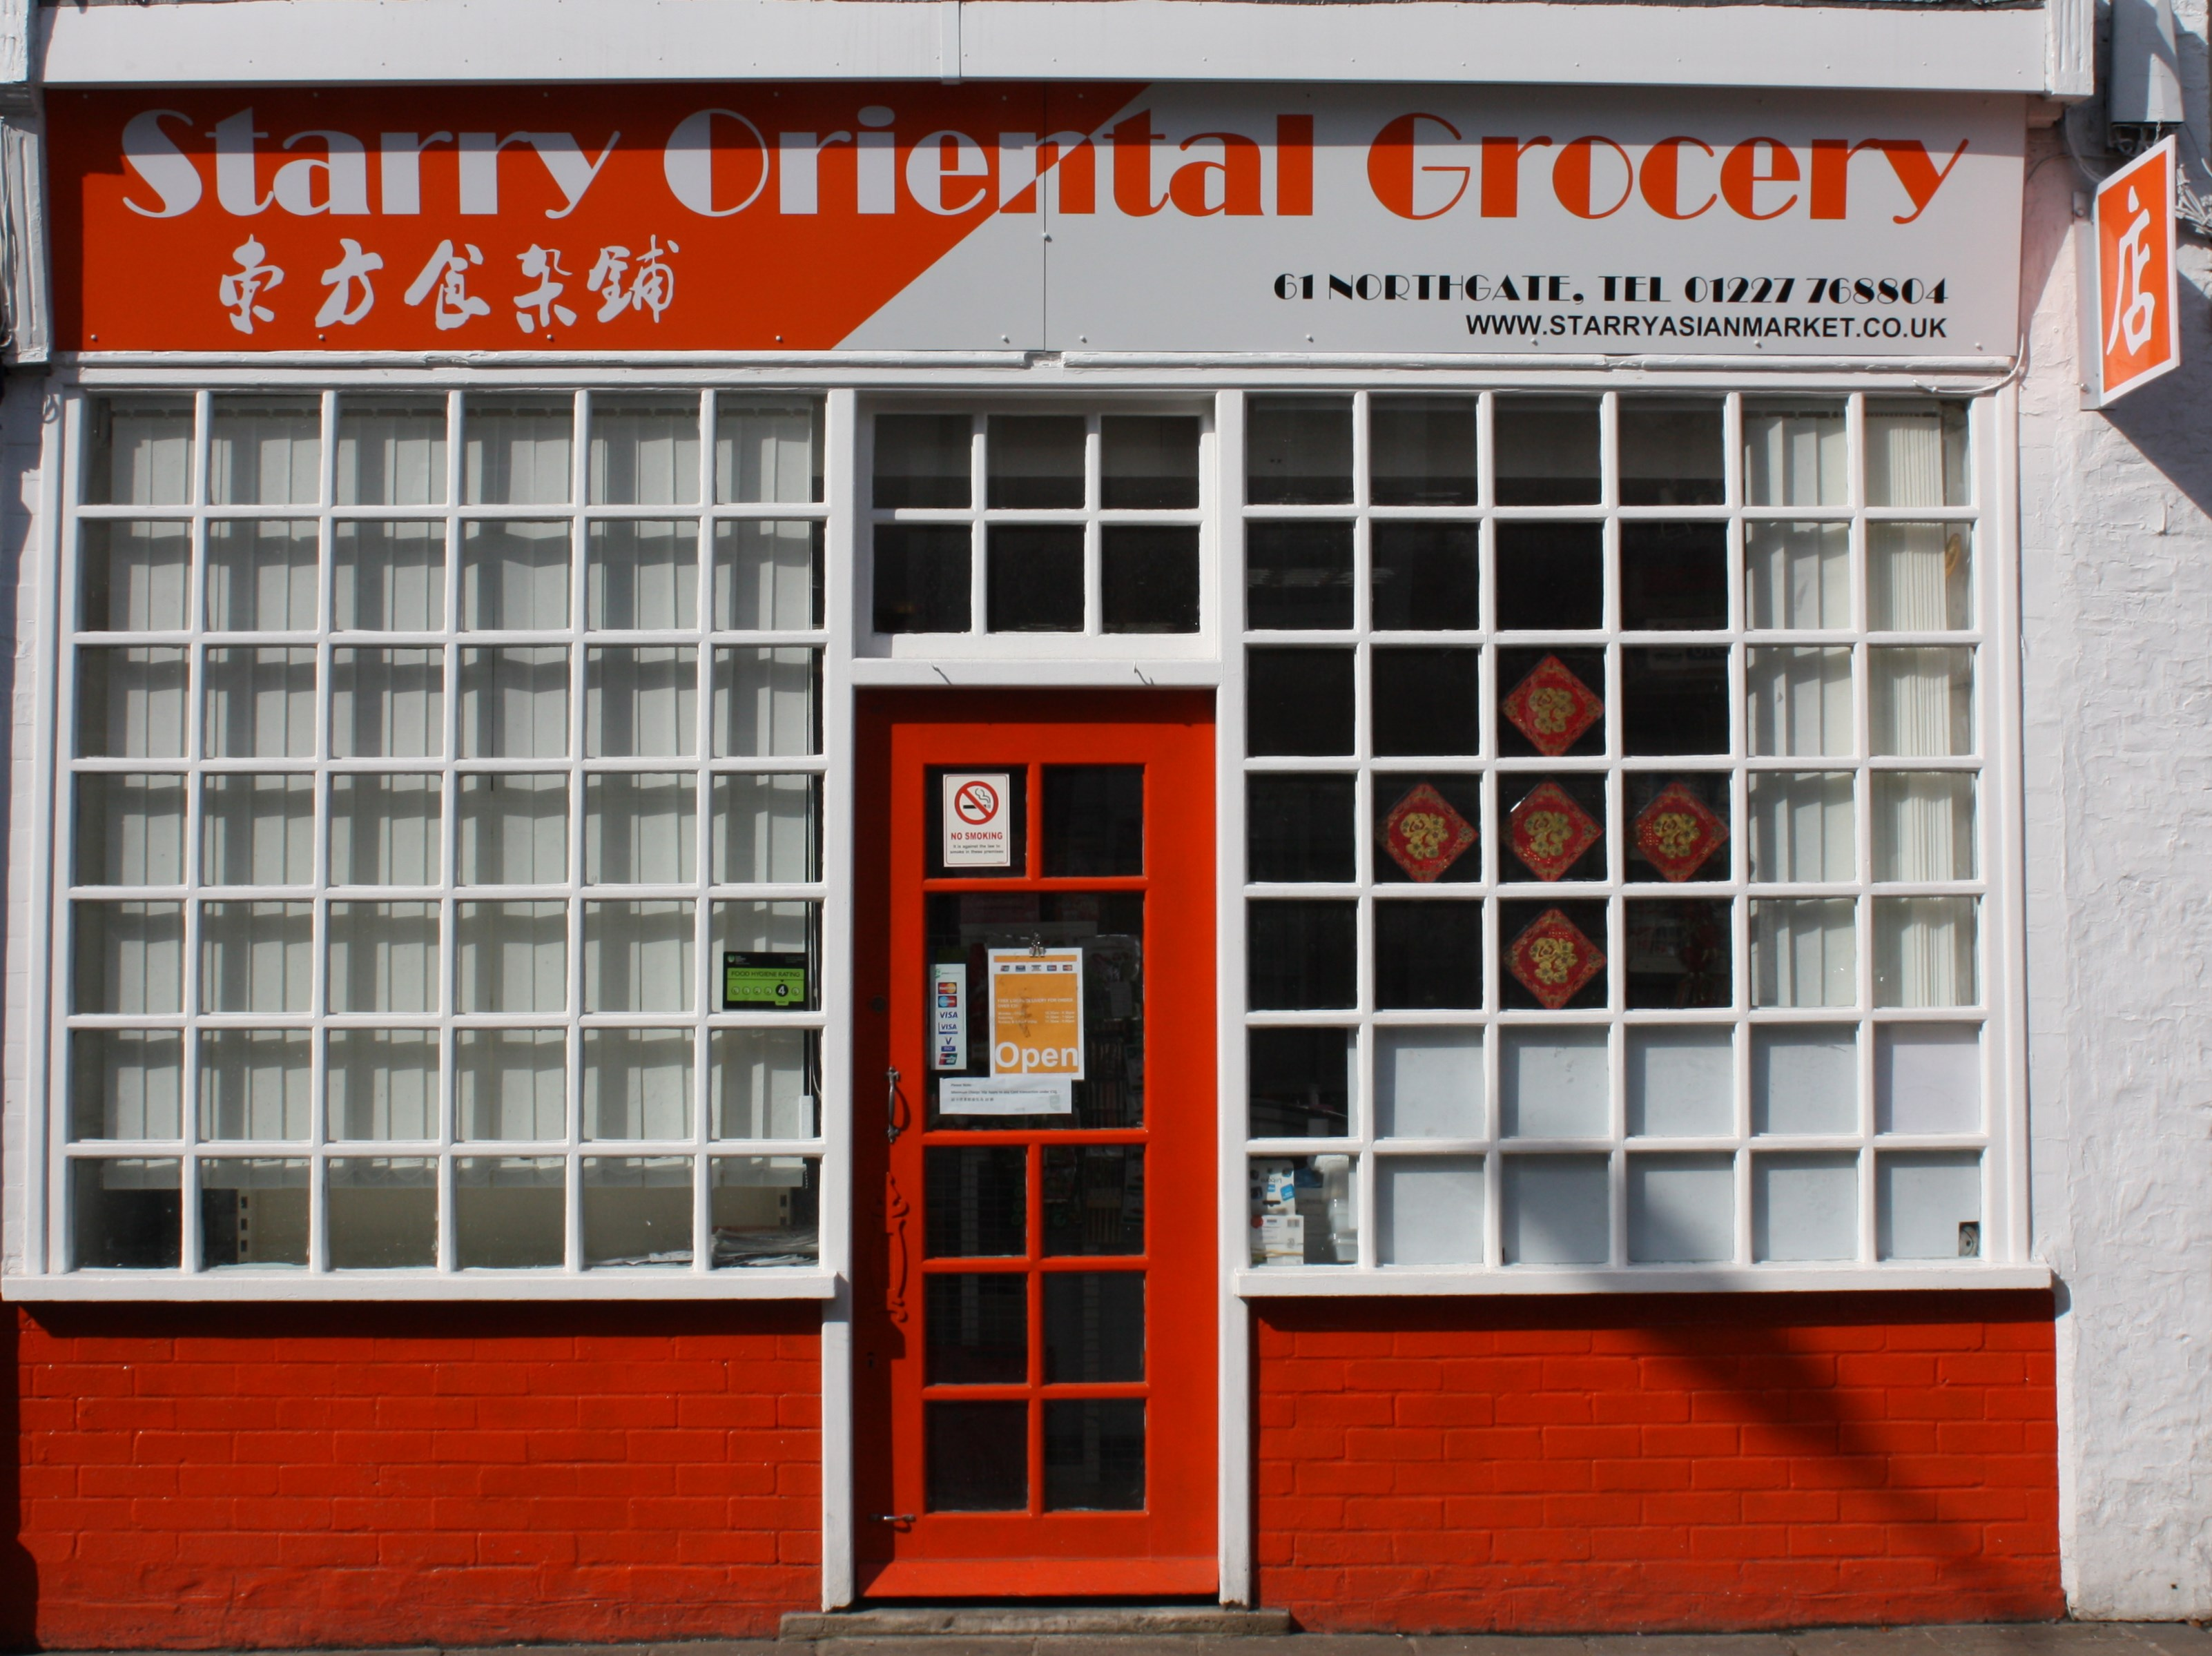 Starry Oriental Grocery